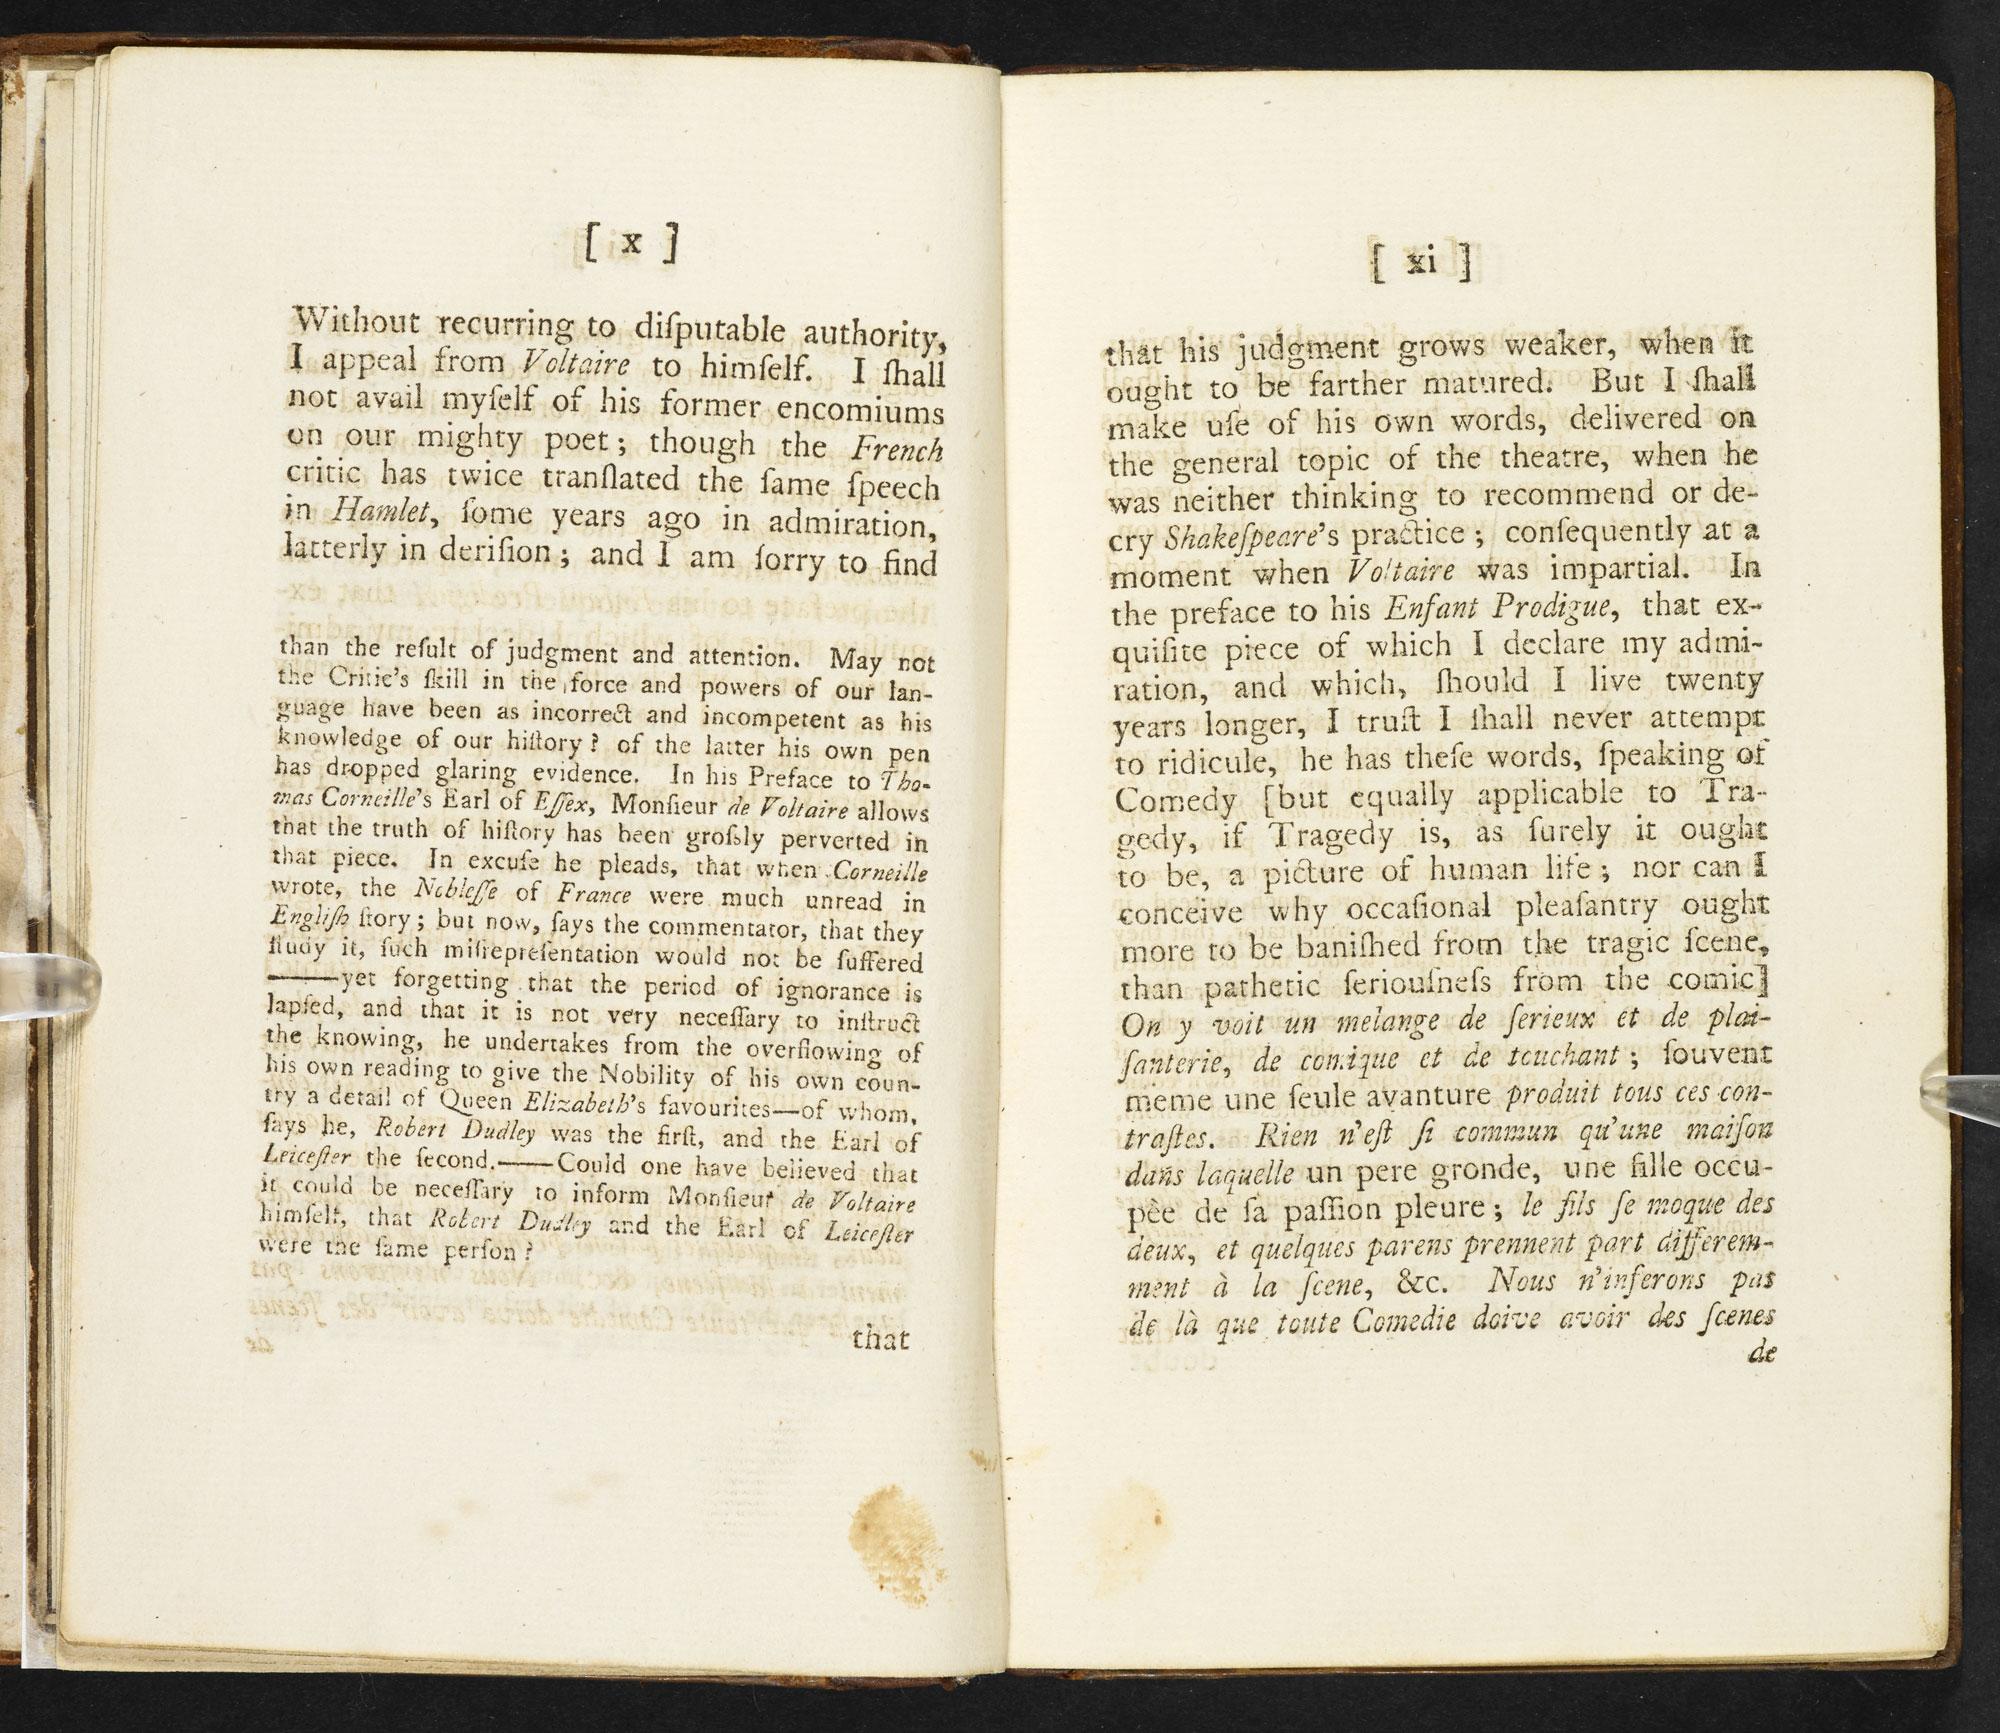 Letter from Robert Louis Stevenson to William Archer, 28 October 1885 [folio: 68r]